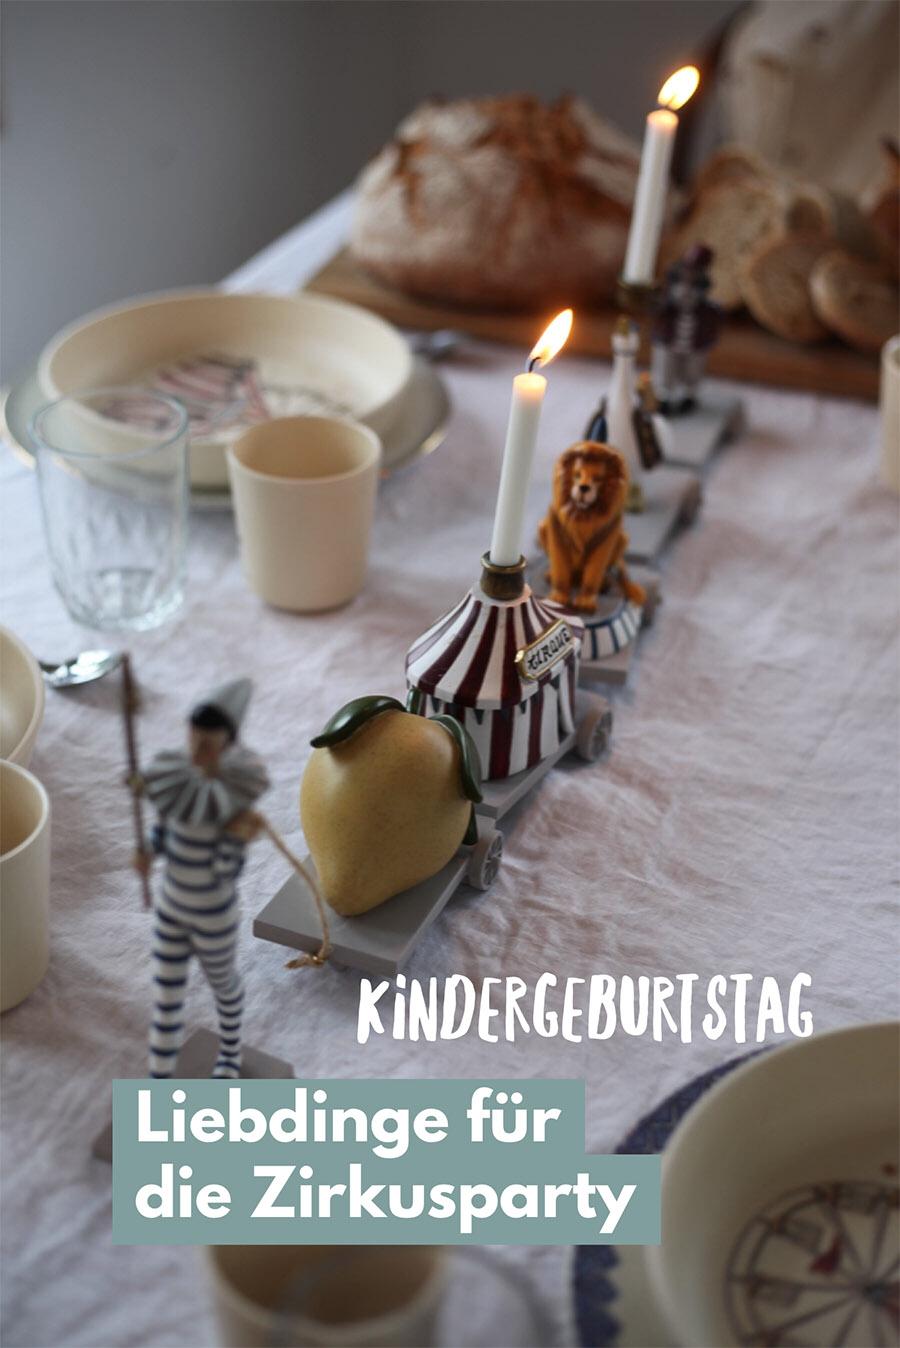 Happy children's birthday: We celebrate a circus party #kindergeburtstag #geburtstag #circus party